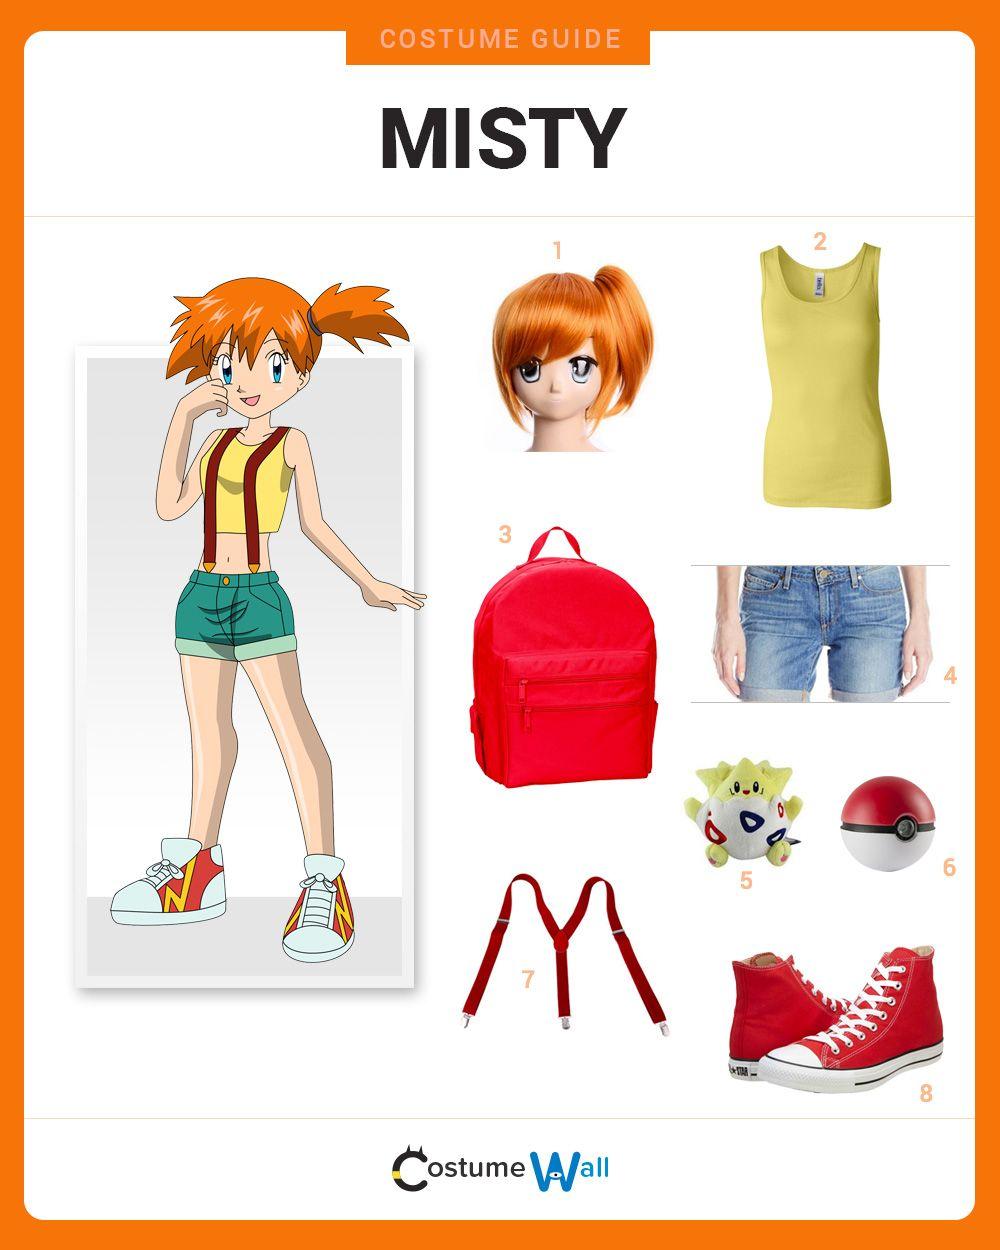 dress like misty misty costume pok233mon and video games